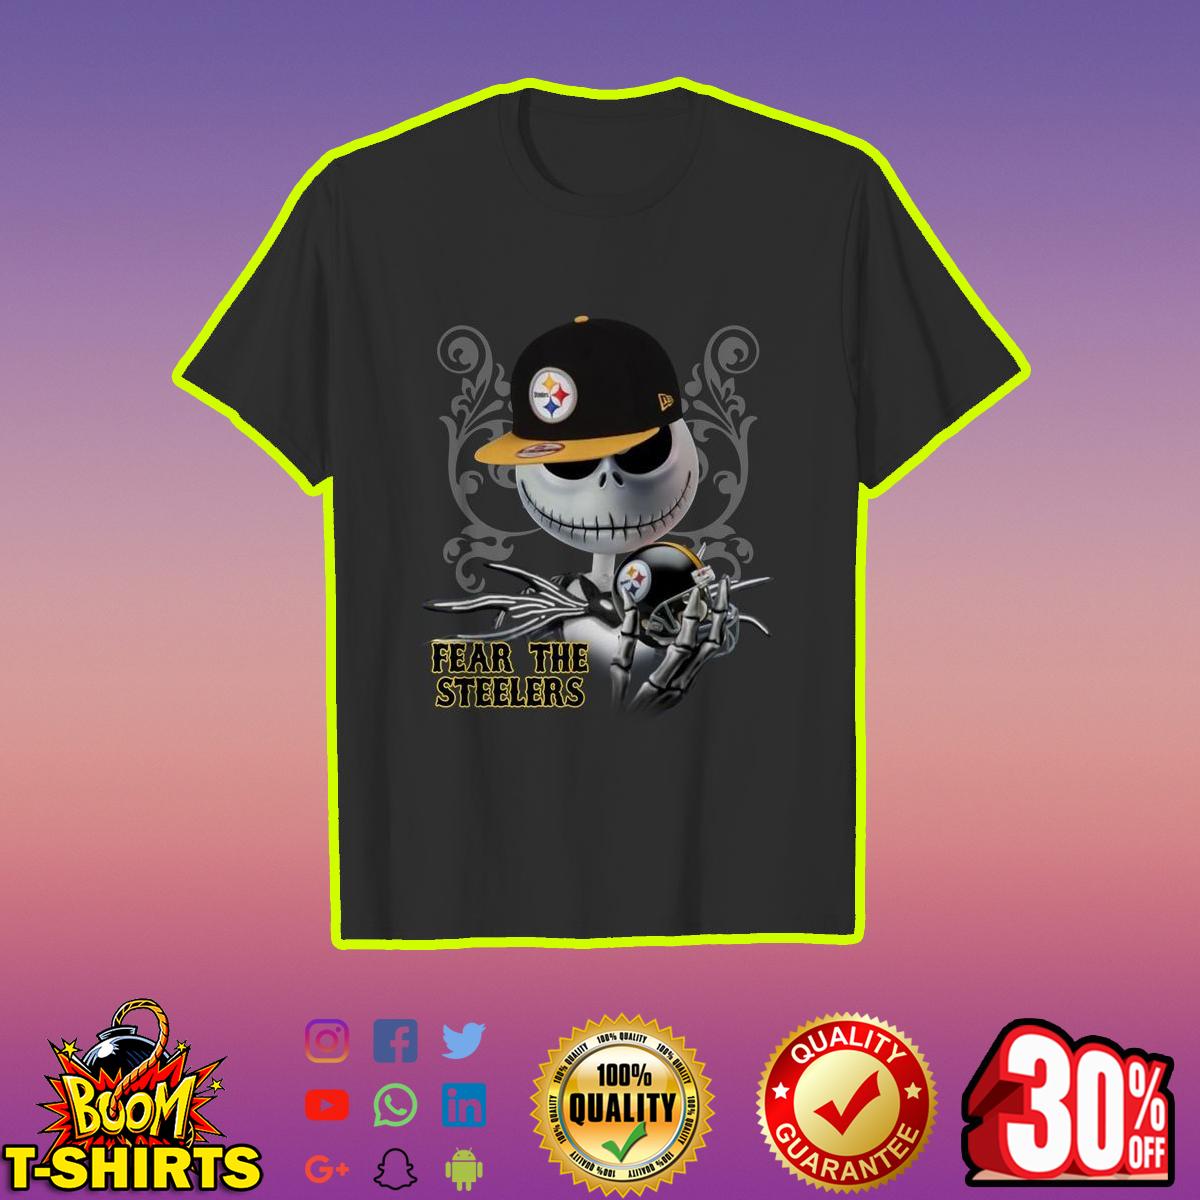 Jack Skellington Fear The Steelers shirt - black